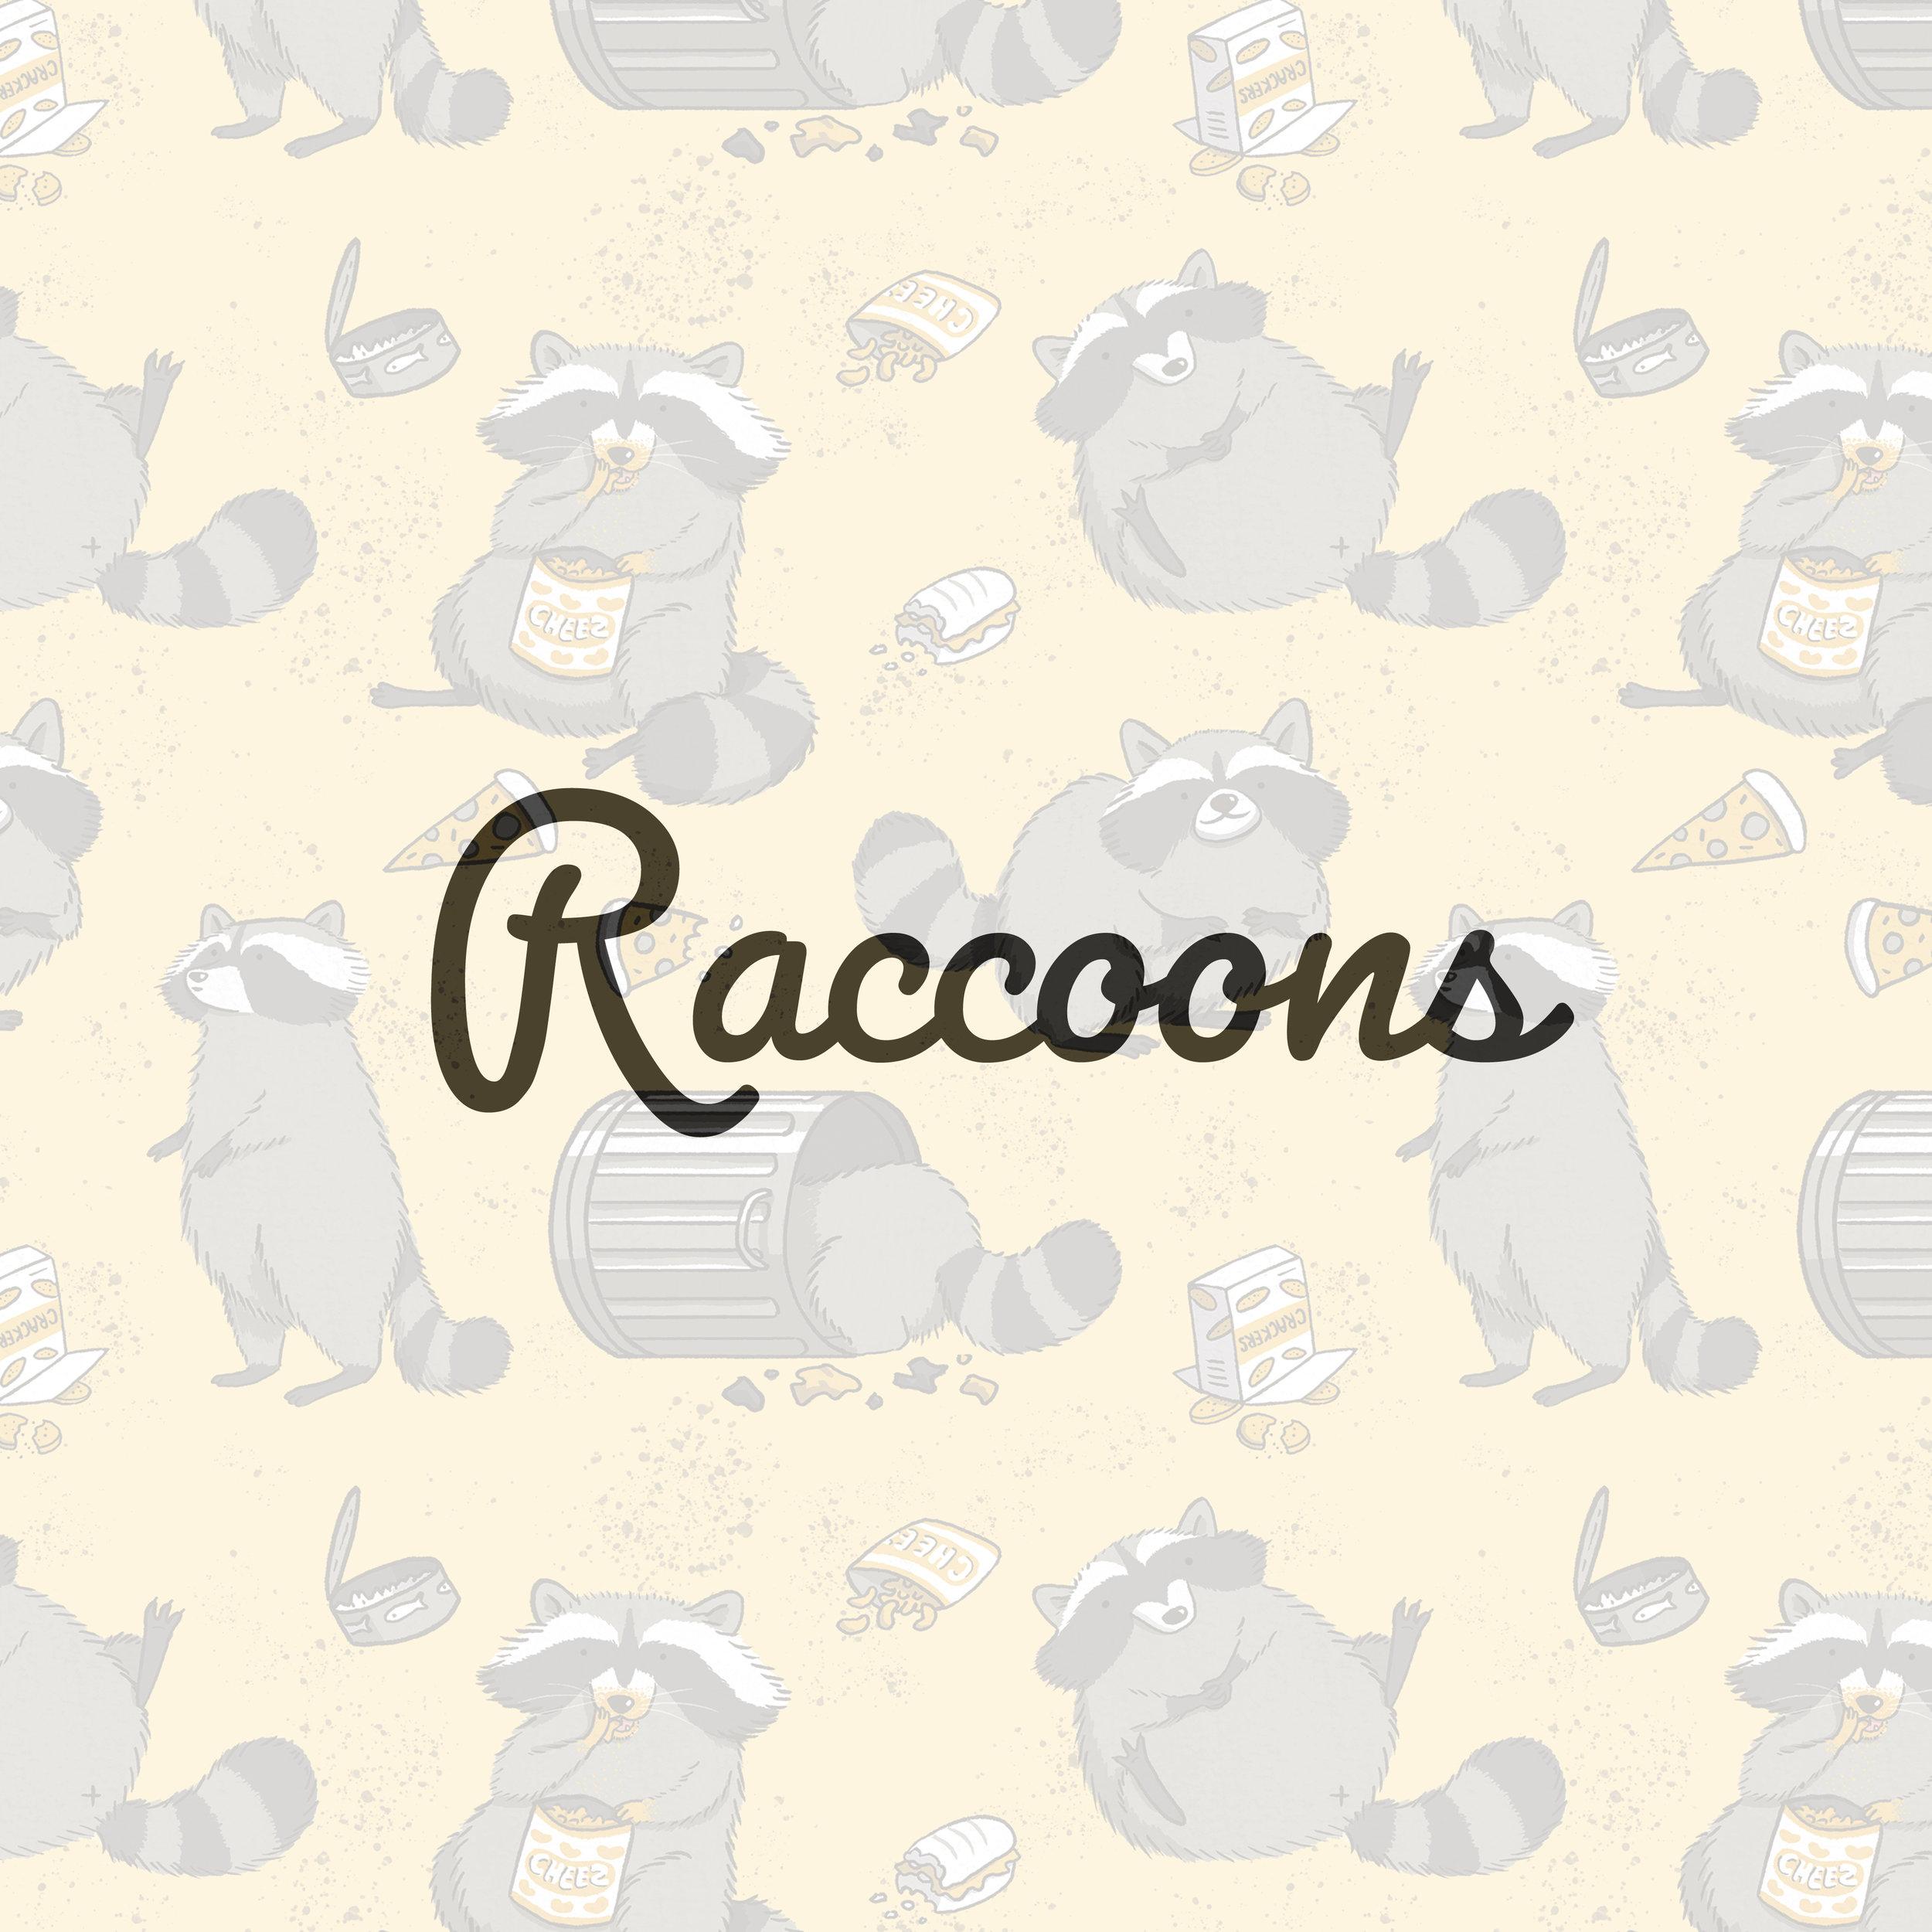 Raccoons_square.jpg